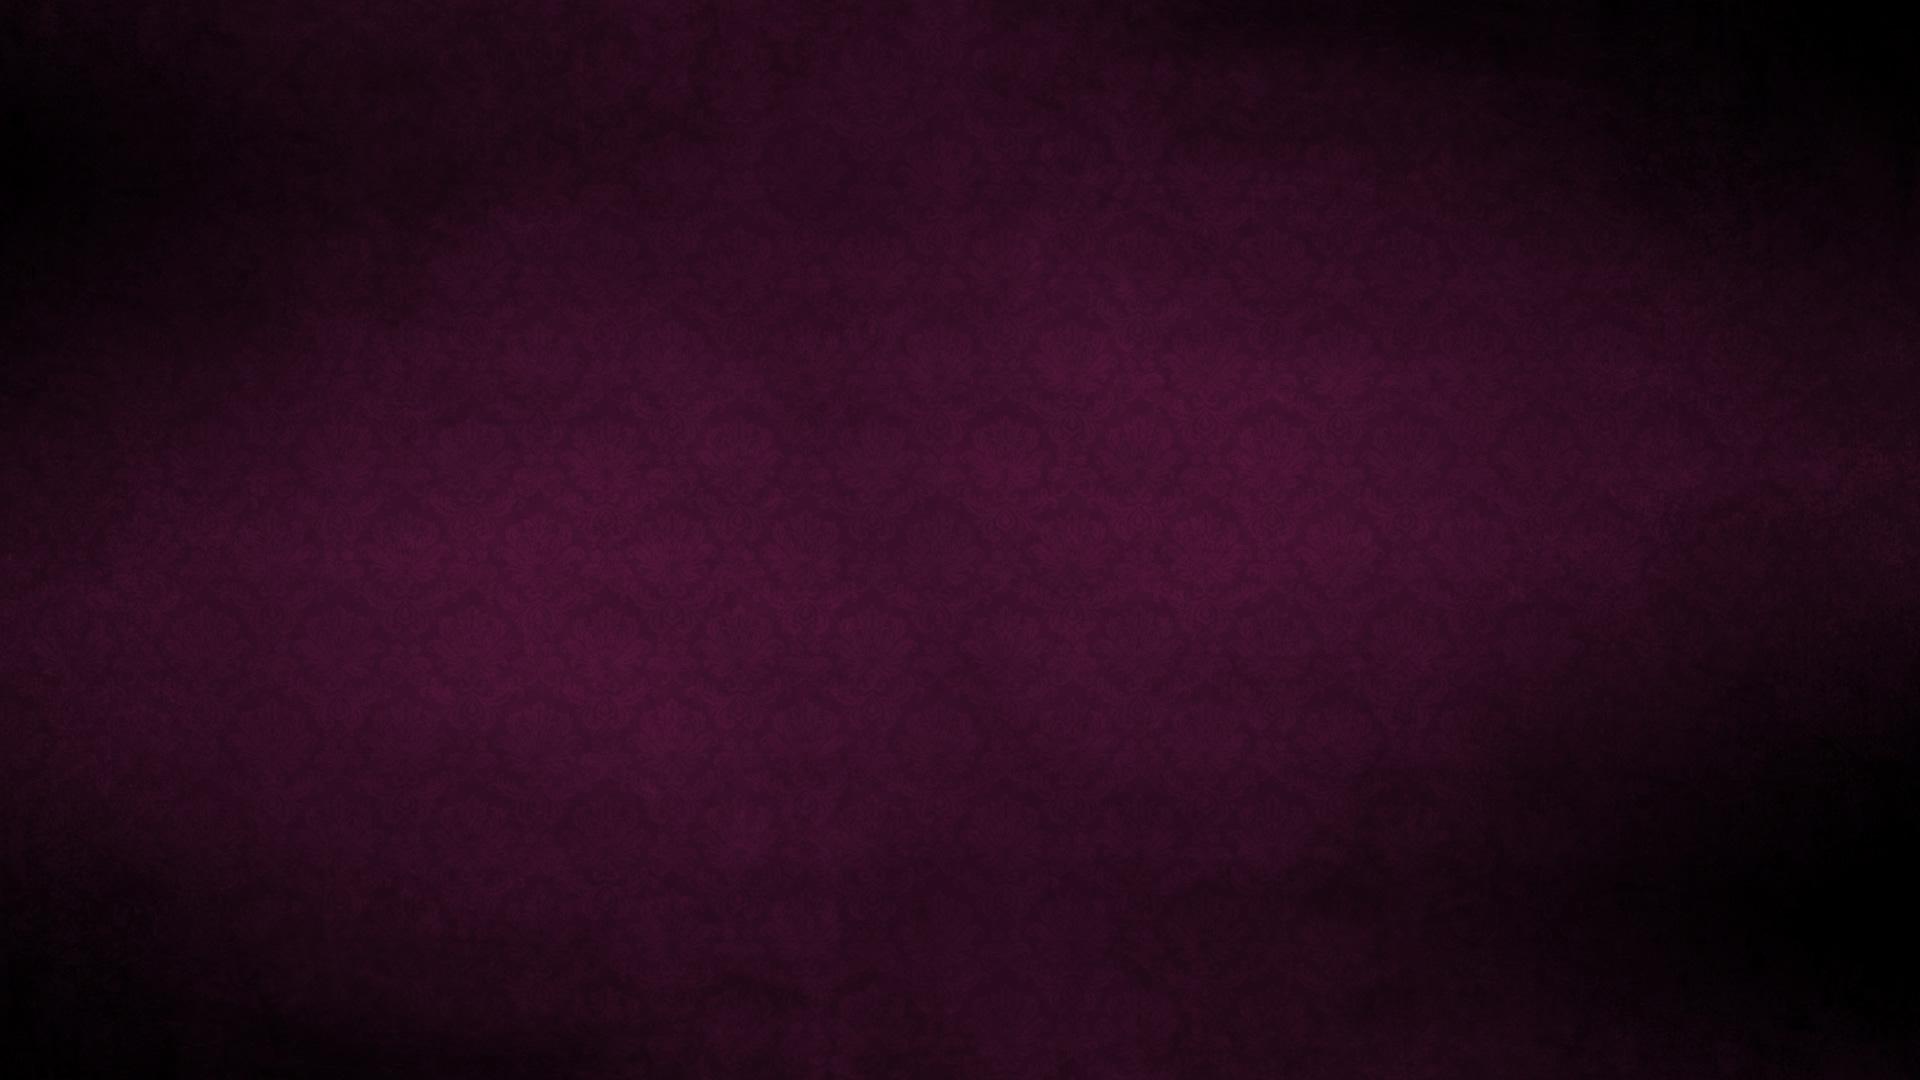 Download Plain Victorian Wallpaper 1920x1080 Wallpoper 1920x1080